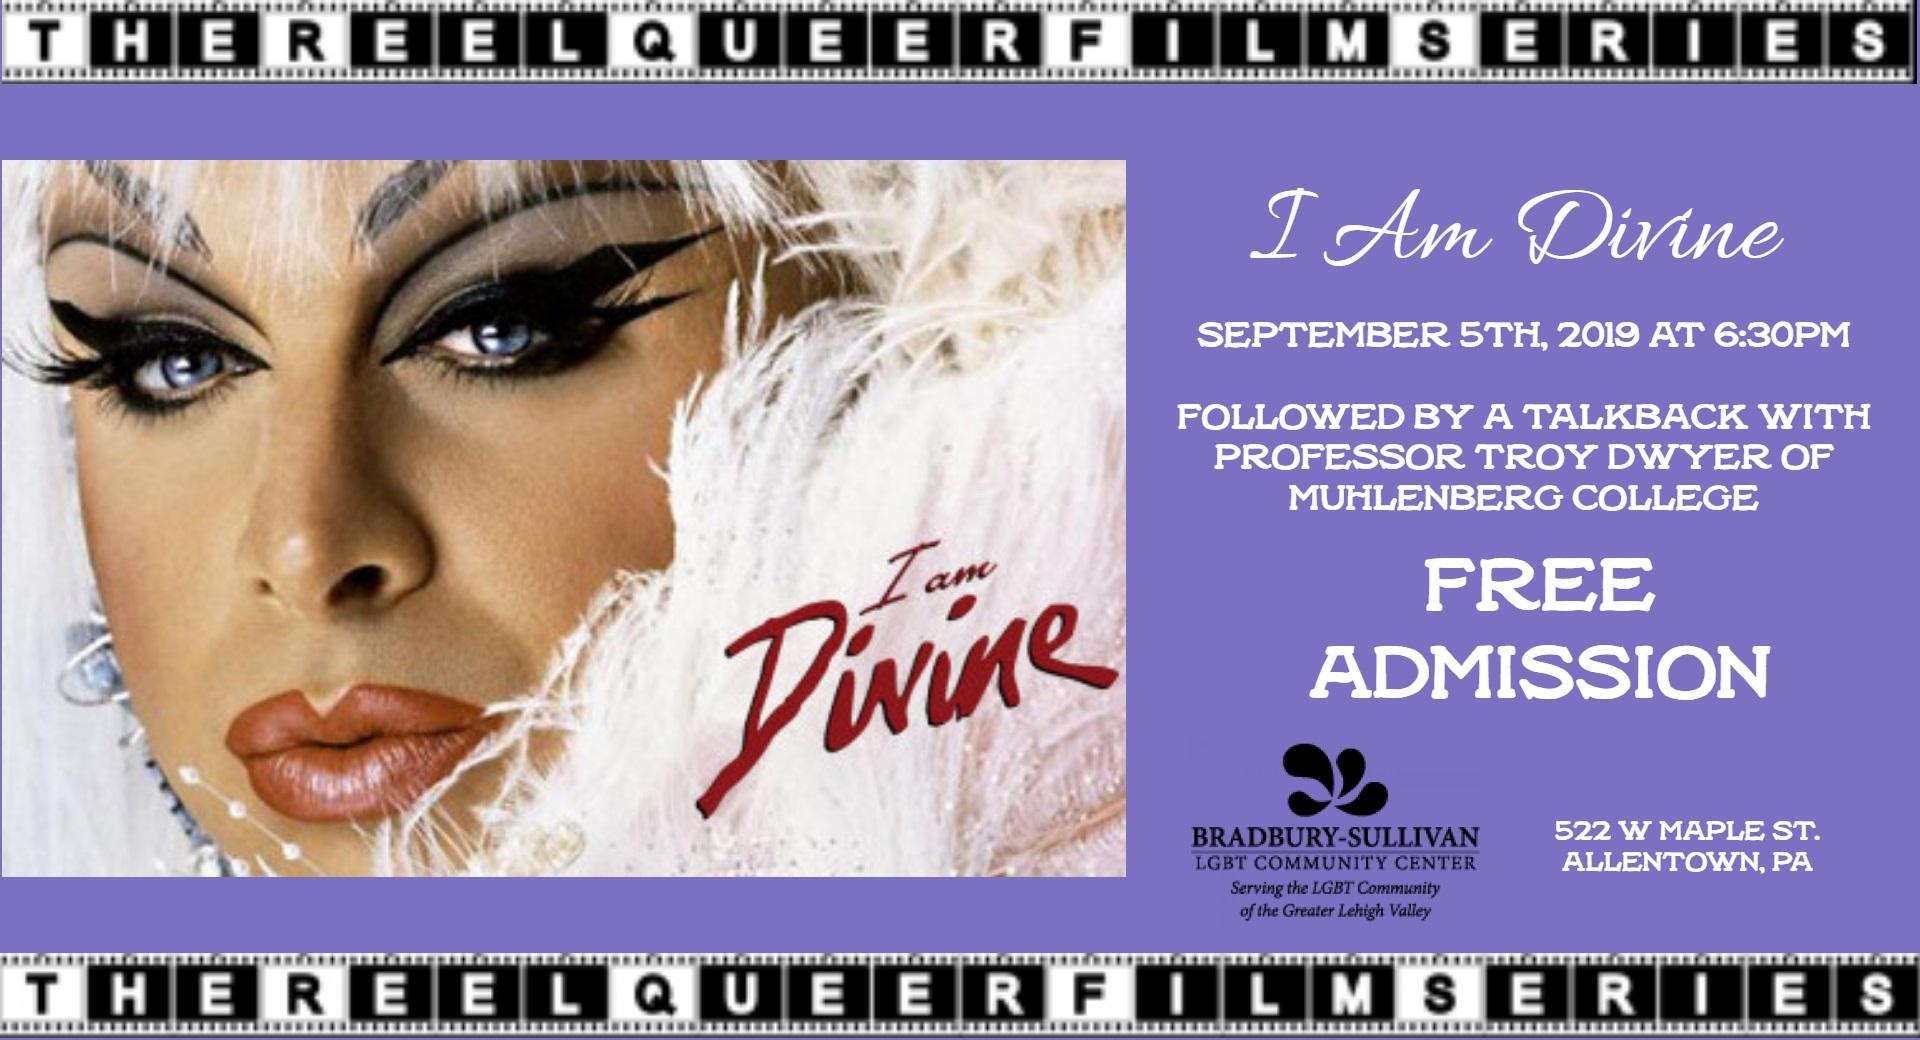 Reel Queer Film Series - Bradbury-Sullivan LGBT Community Center